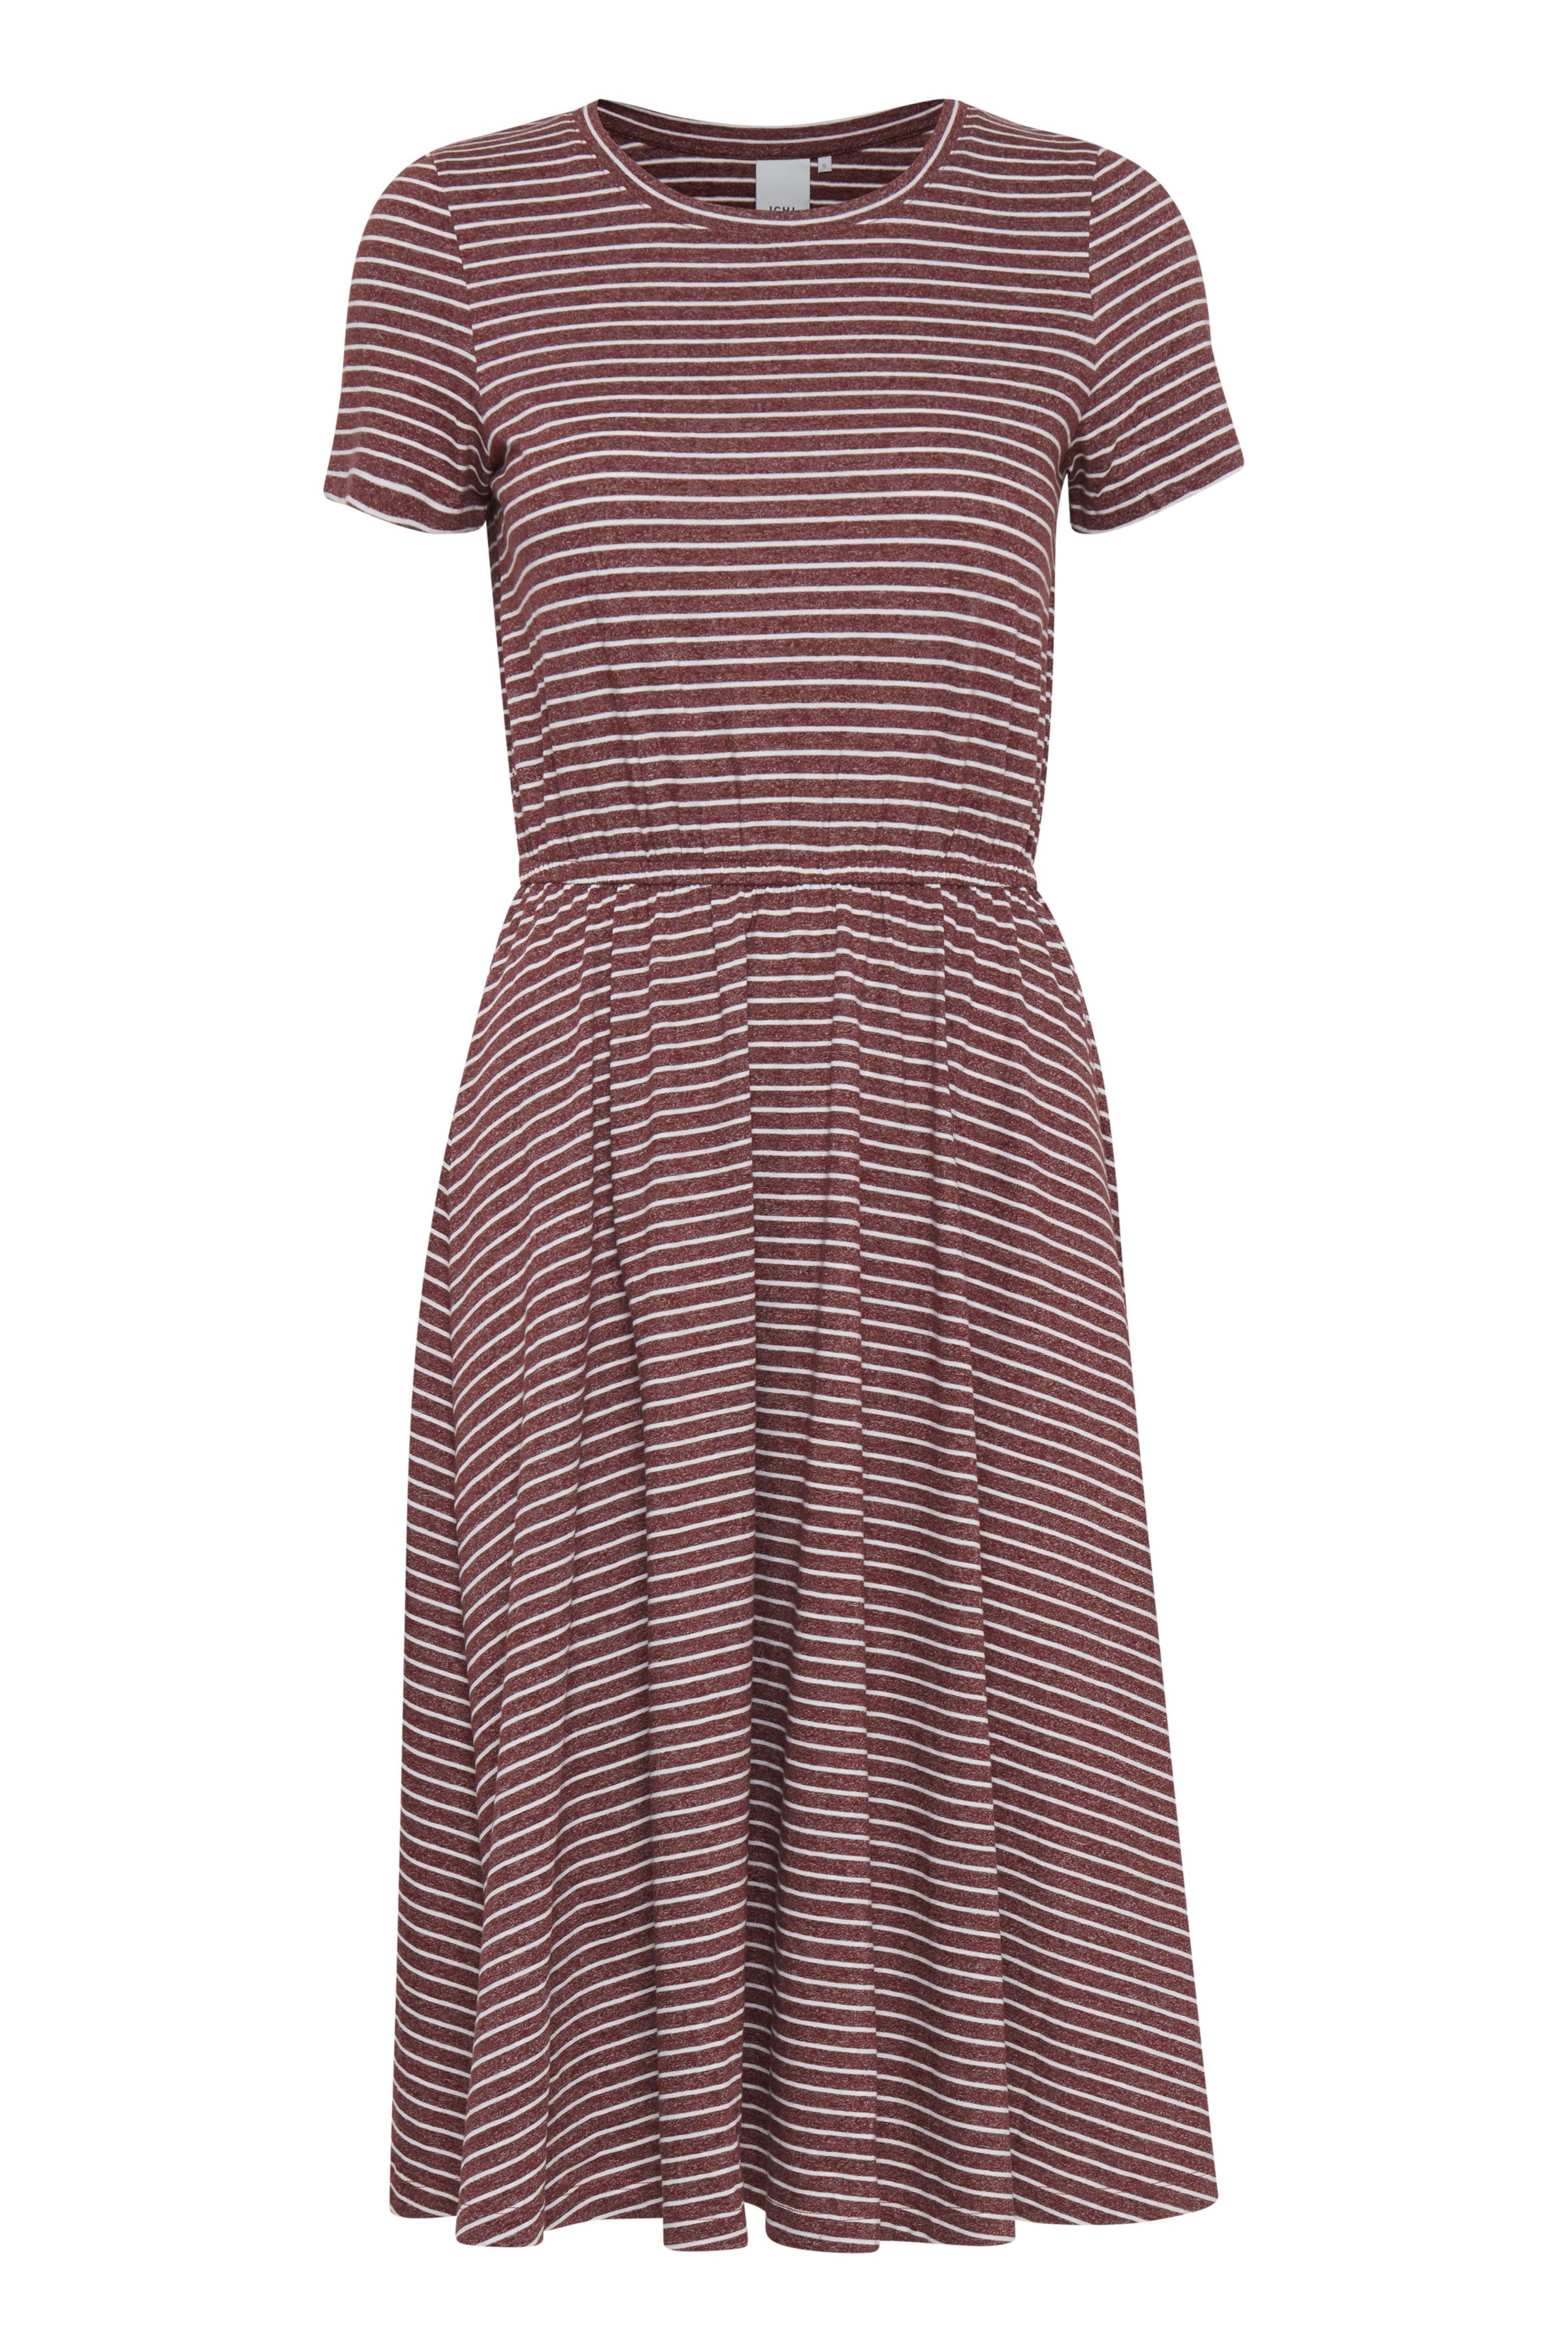 Small Stripe Andorra Jerseykjole – Køb Small Stripe Andorra Jerseykjole fra str. XS-L her